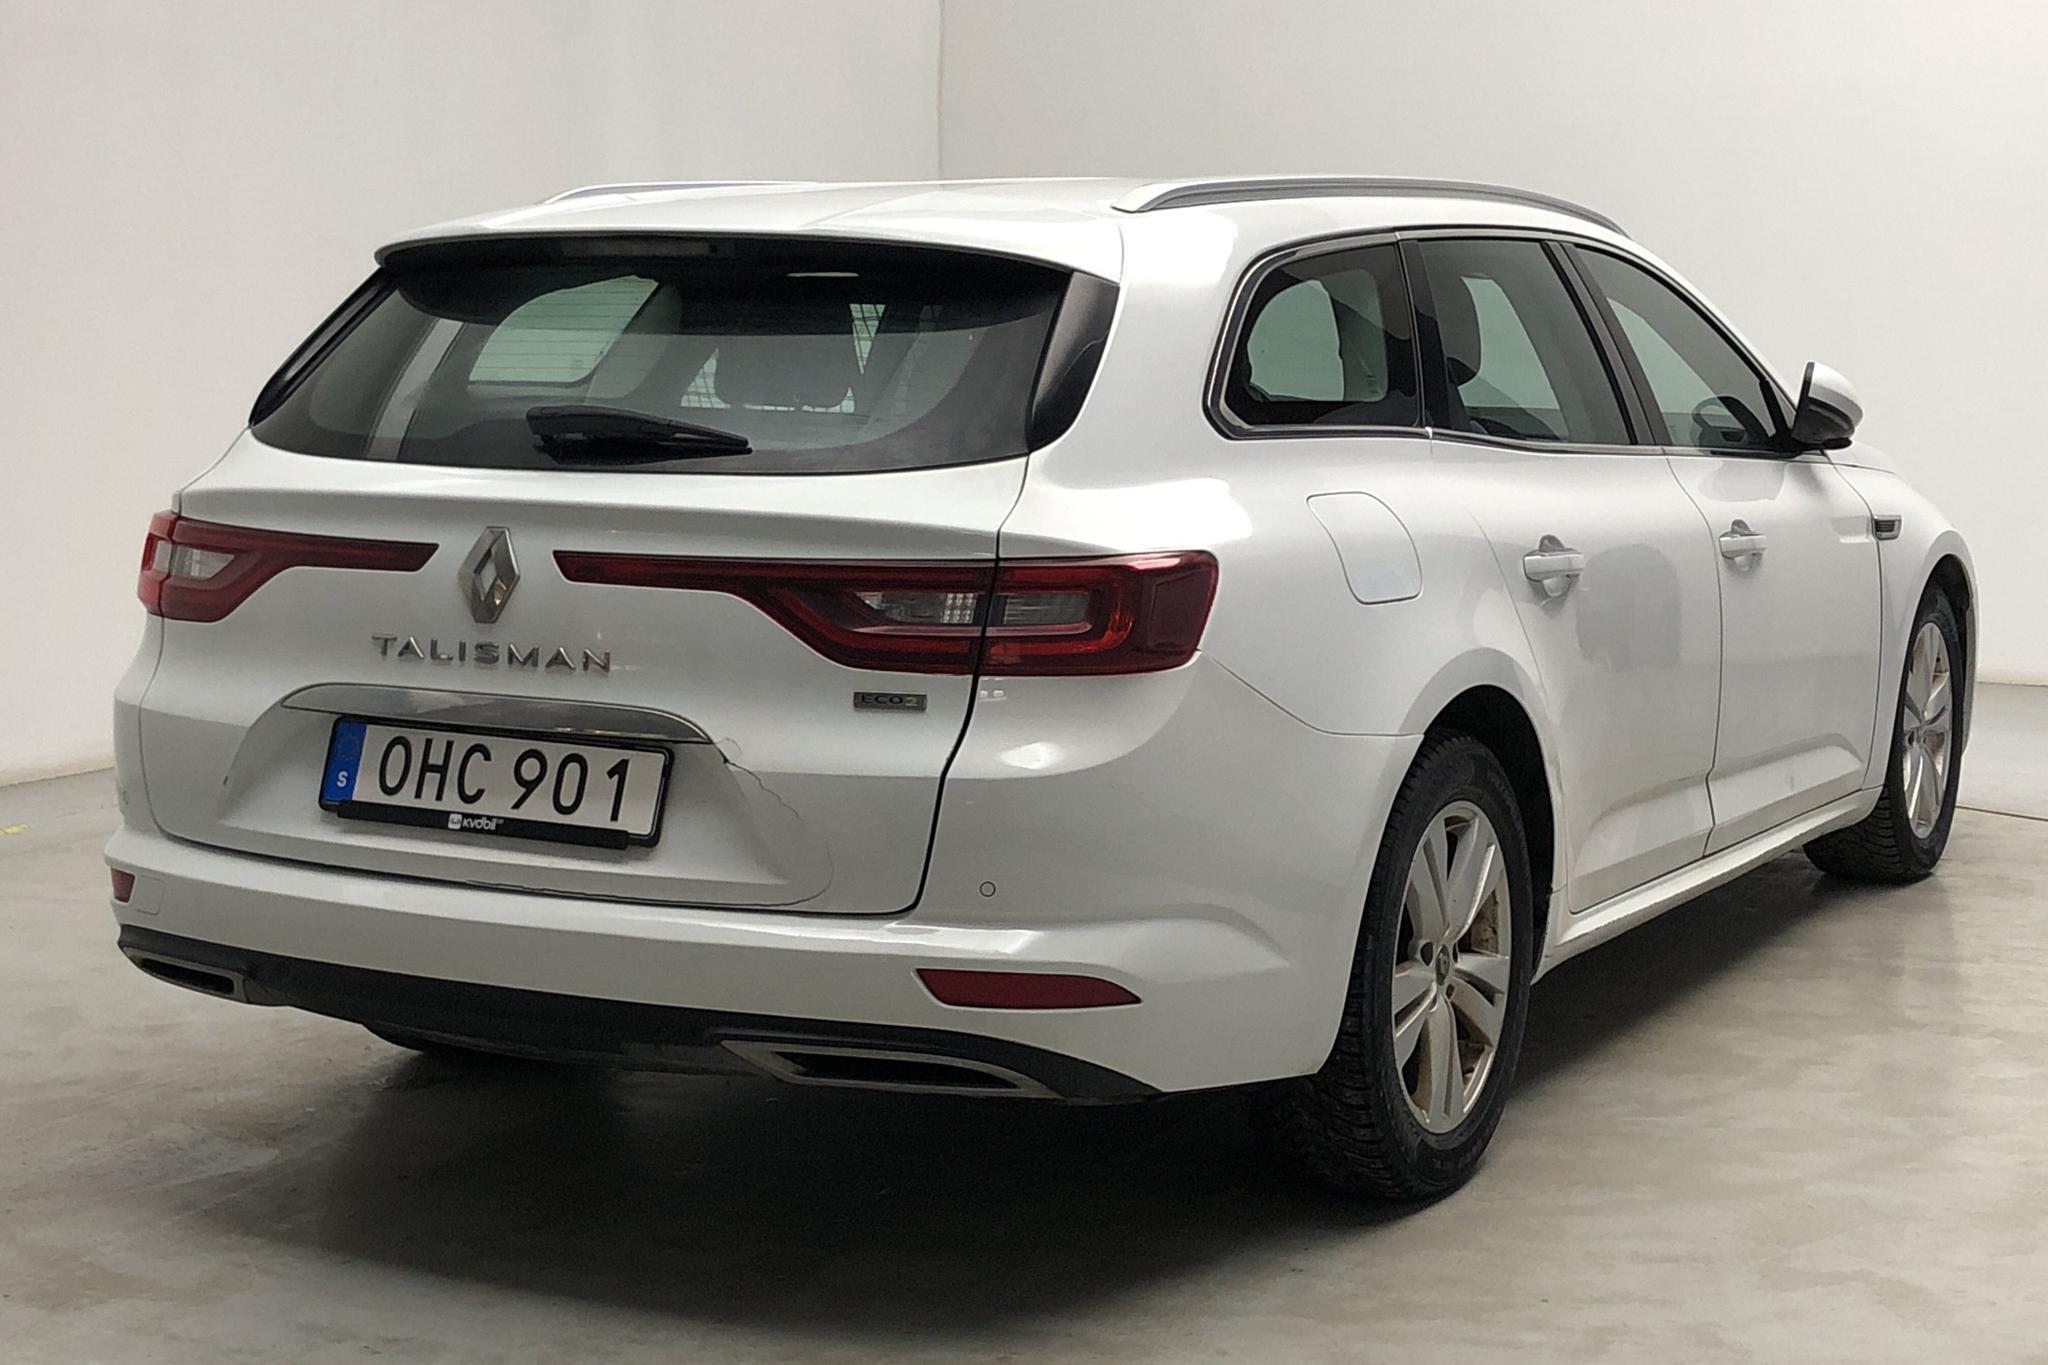 Renault Talisman 1.5 dCi Kombi (110hk) - 39 116 mil - Automat - vit - 2017